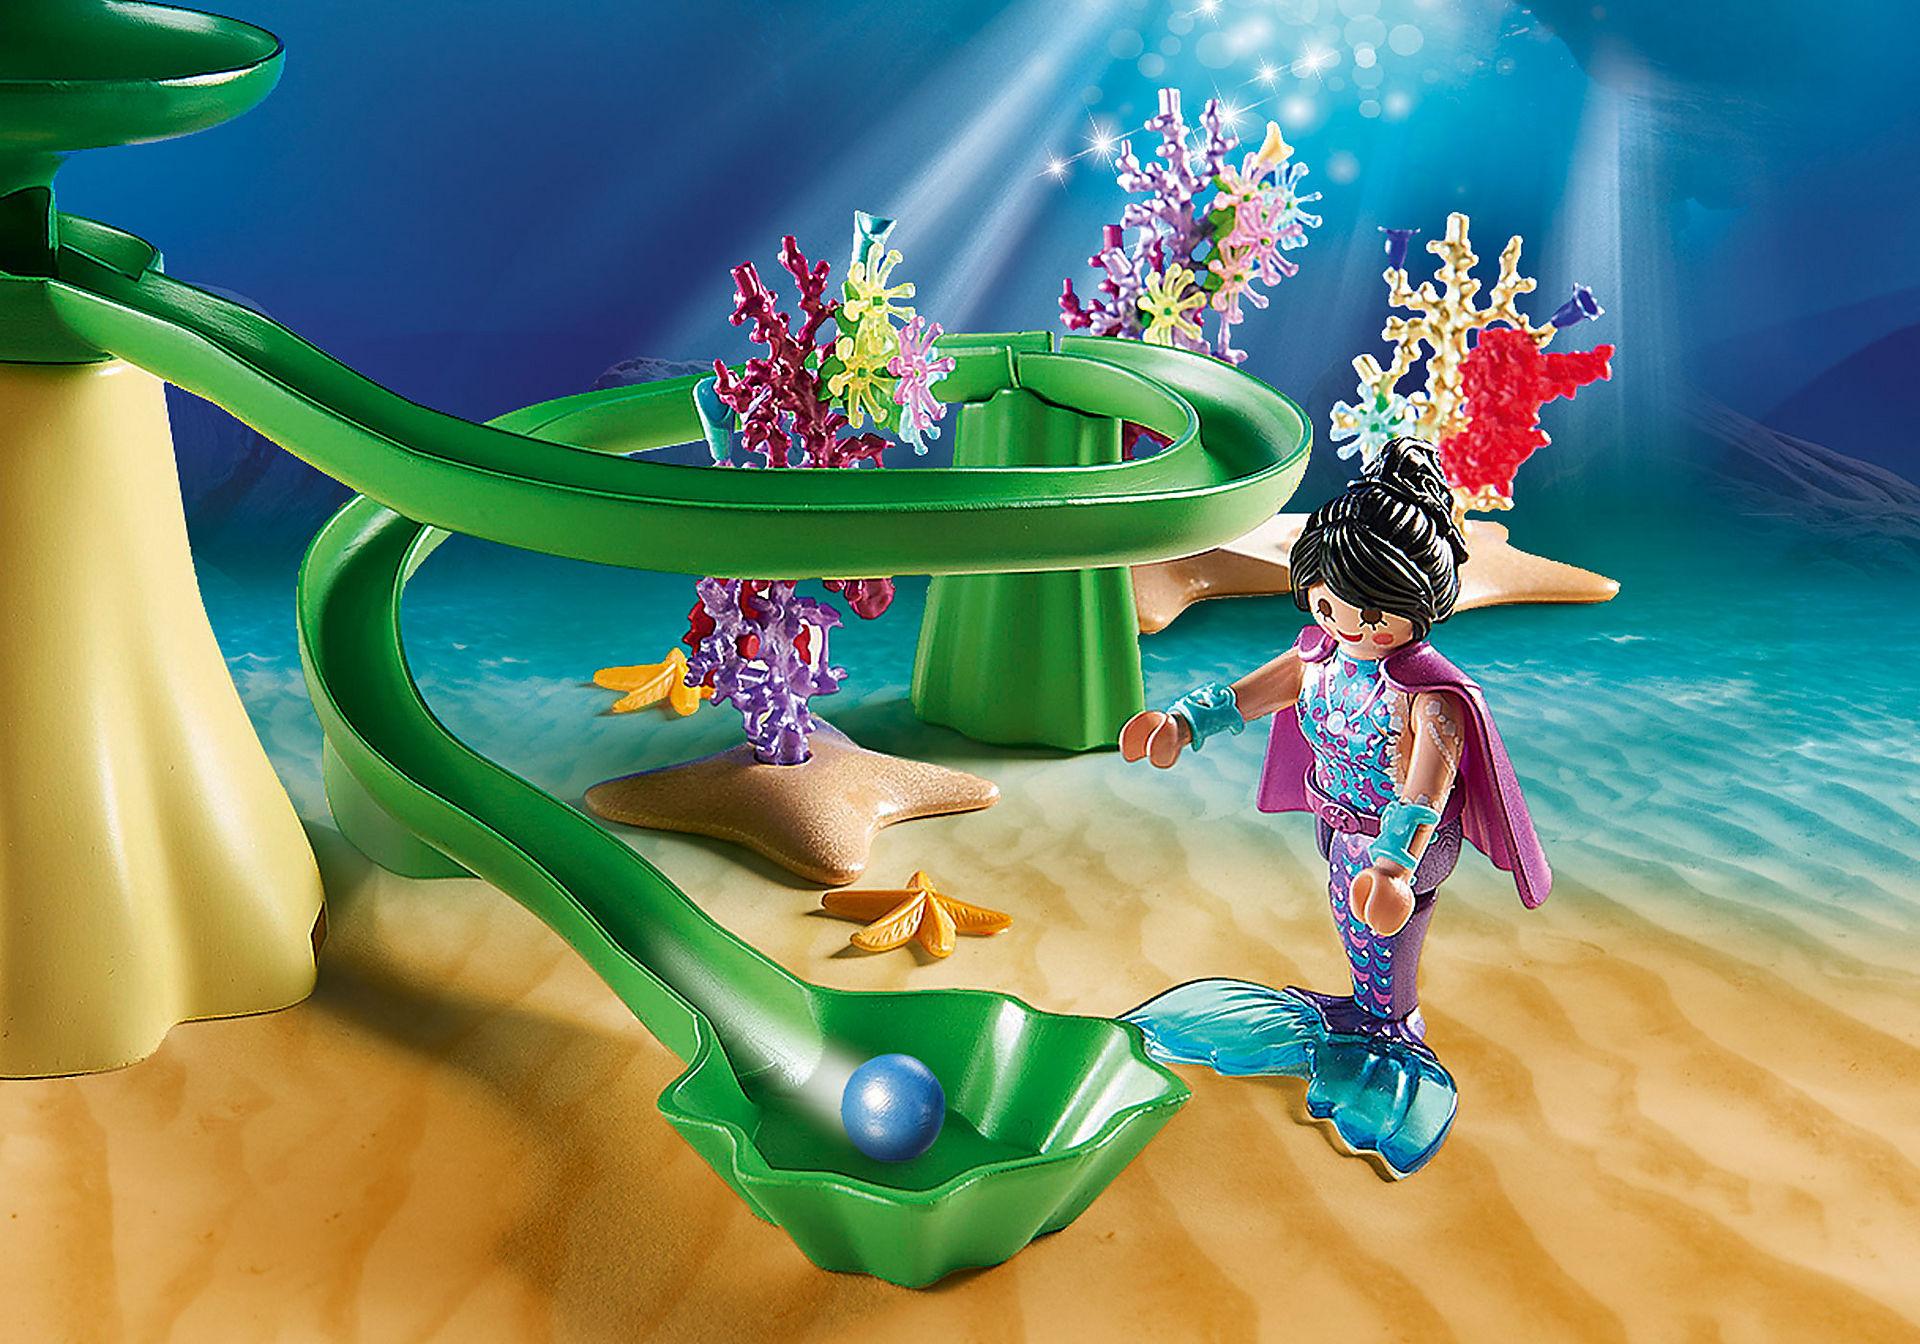 70094 Korallenpavillon mit Leuchtkuppel zoom image5